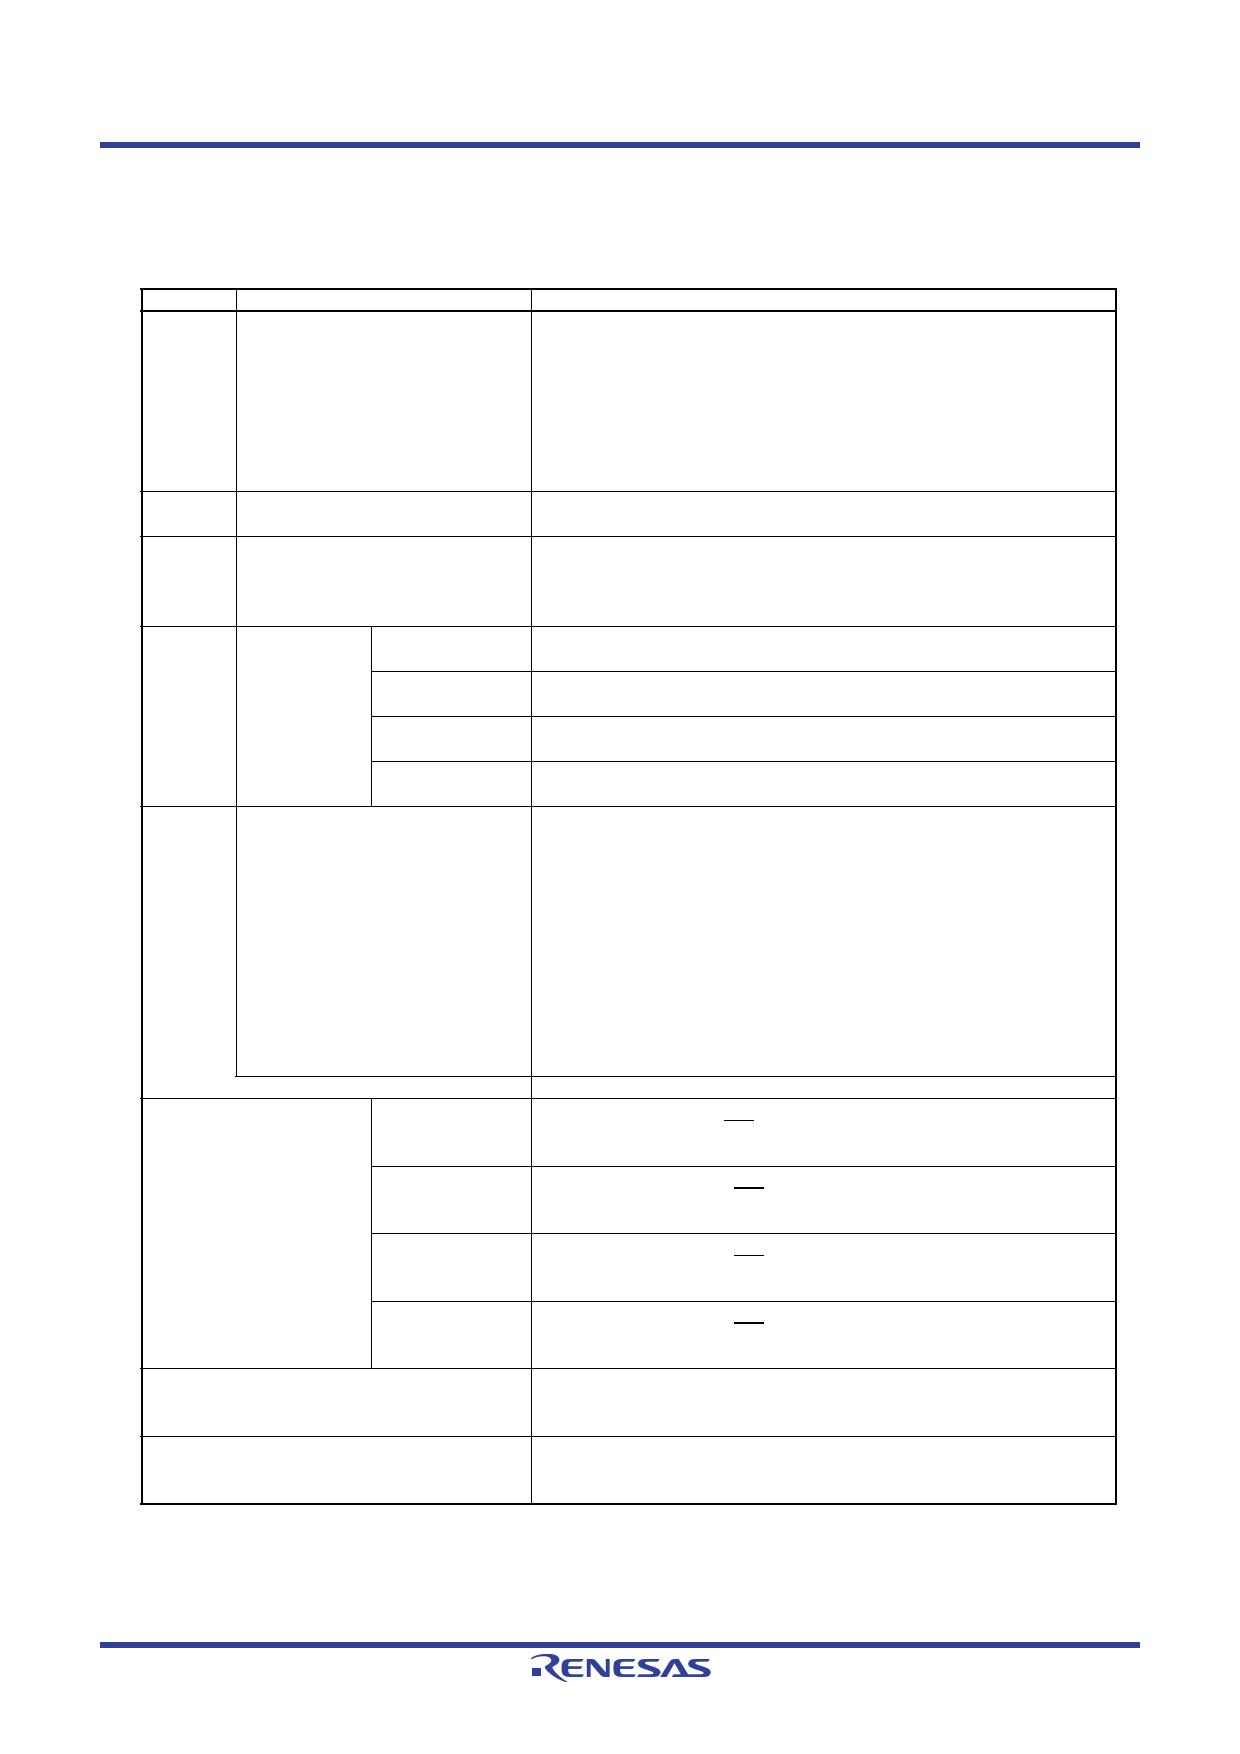 R5F2L35ACDFP pdf, 반도체, 판매, 대치품